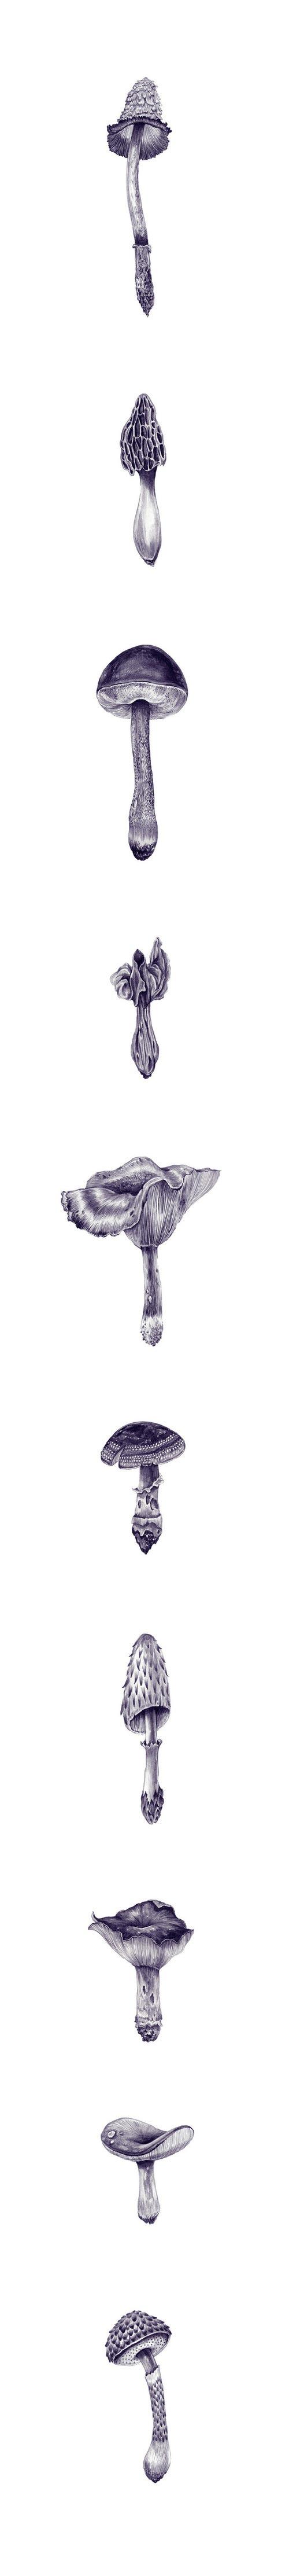 Drawings by artist Eibatova Karina